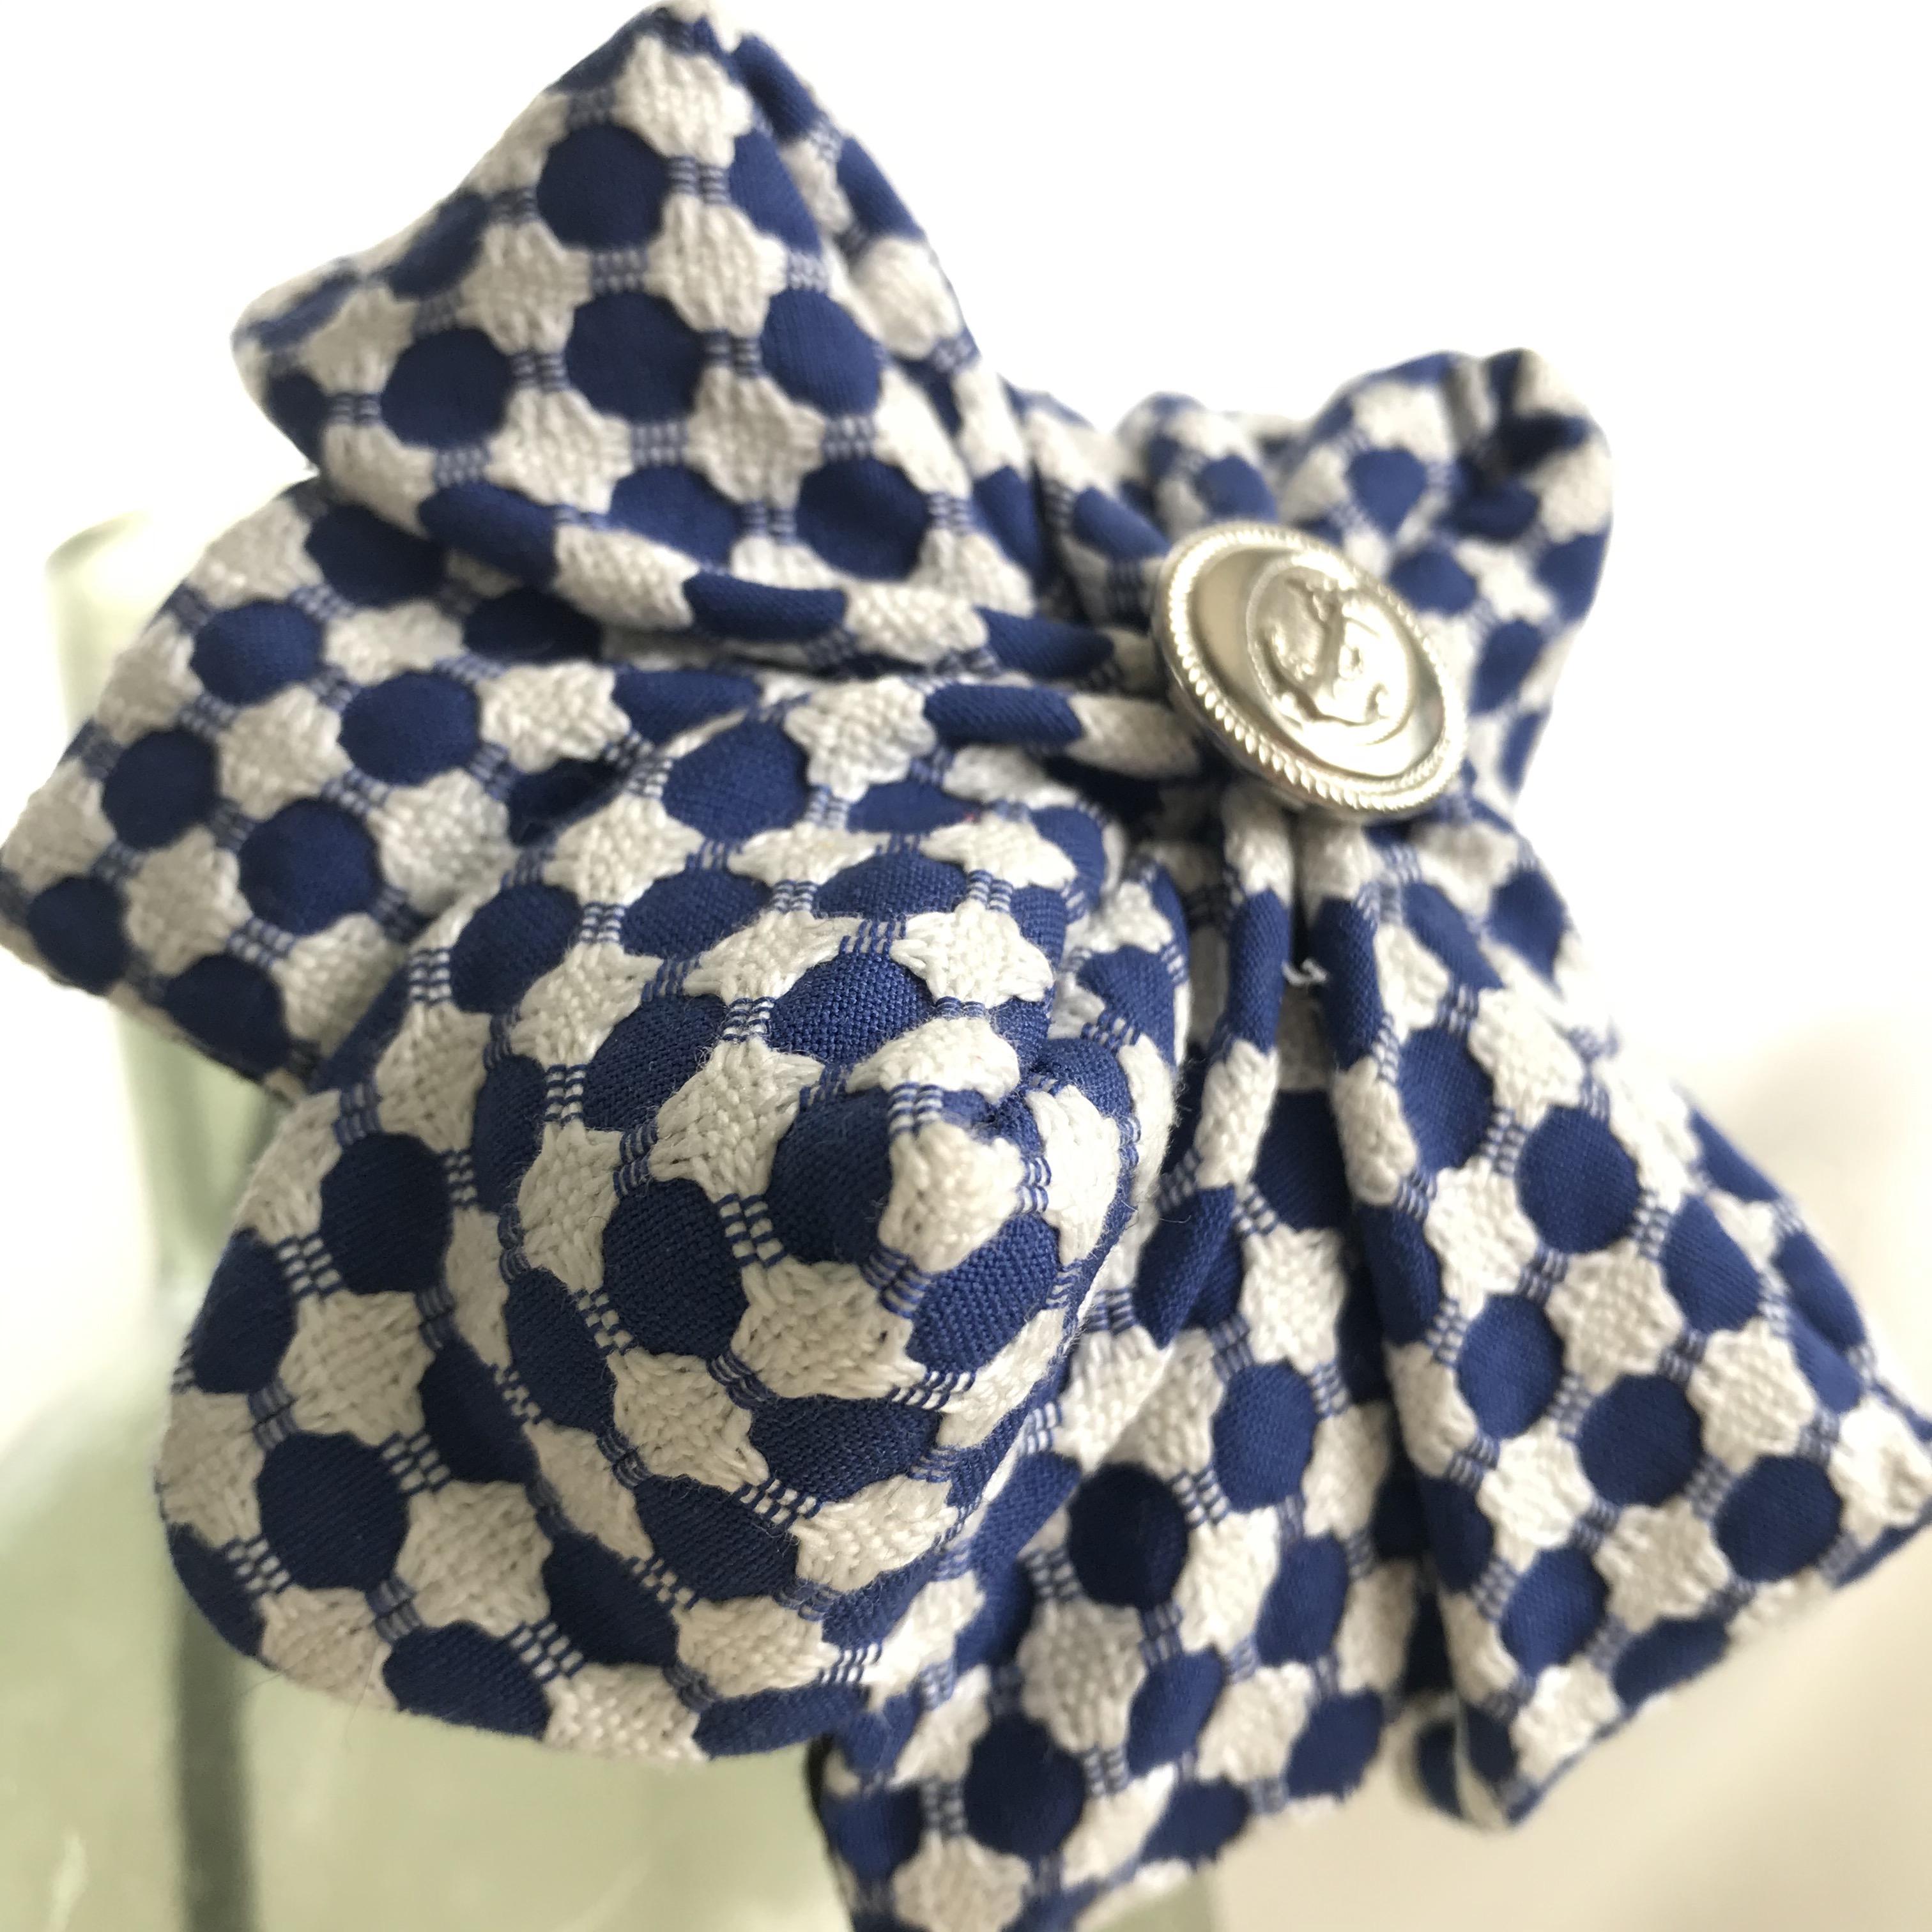 Tyra Therman: Origami-panta, sini-valkoinen, ALE